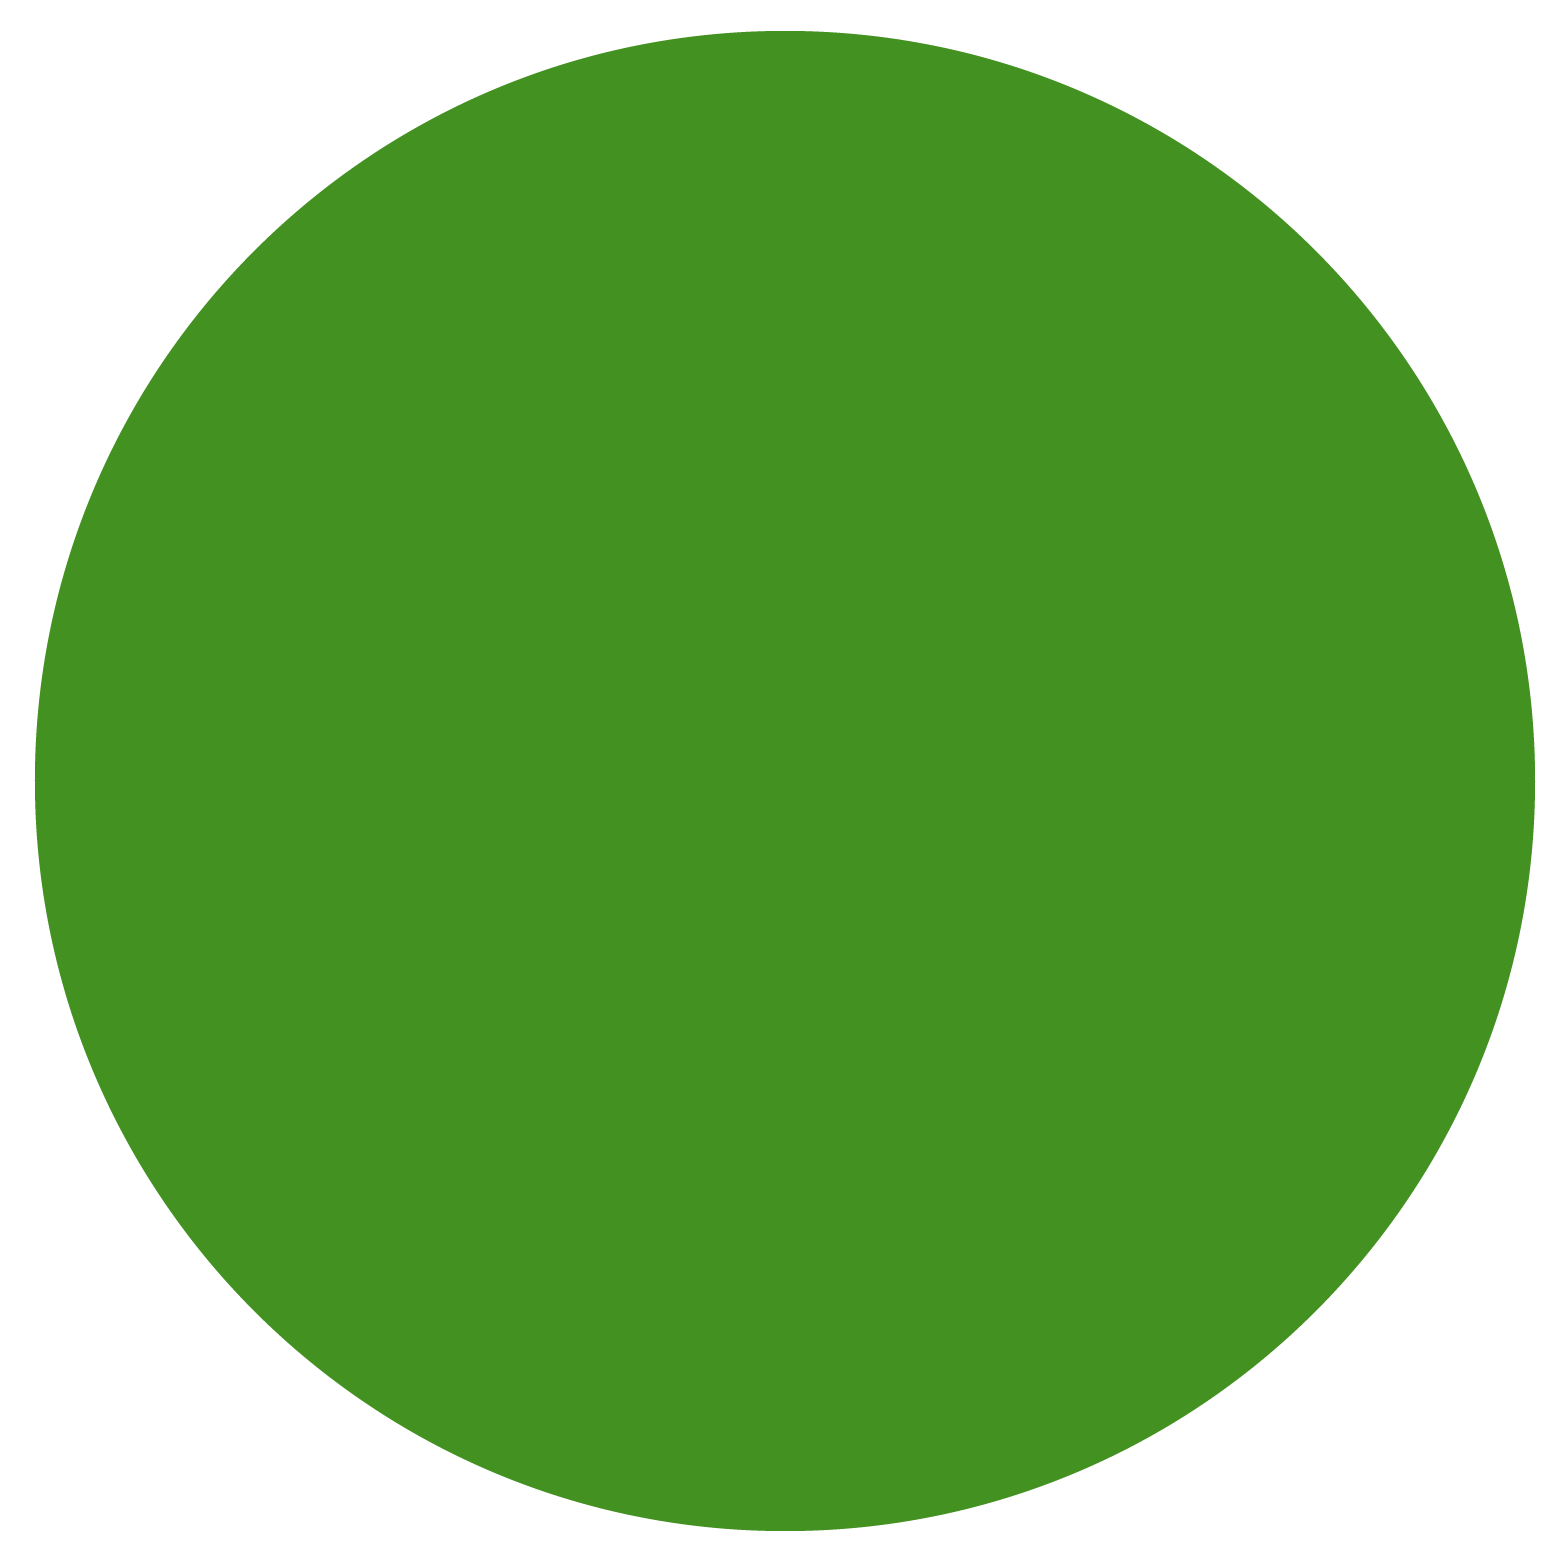 youth-health-education-logo-six-circles-07.png